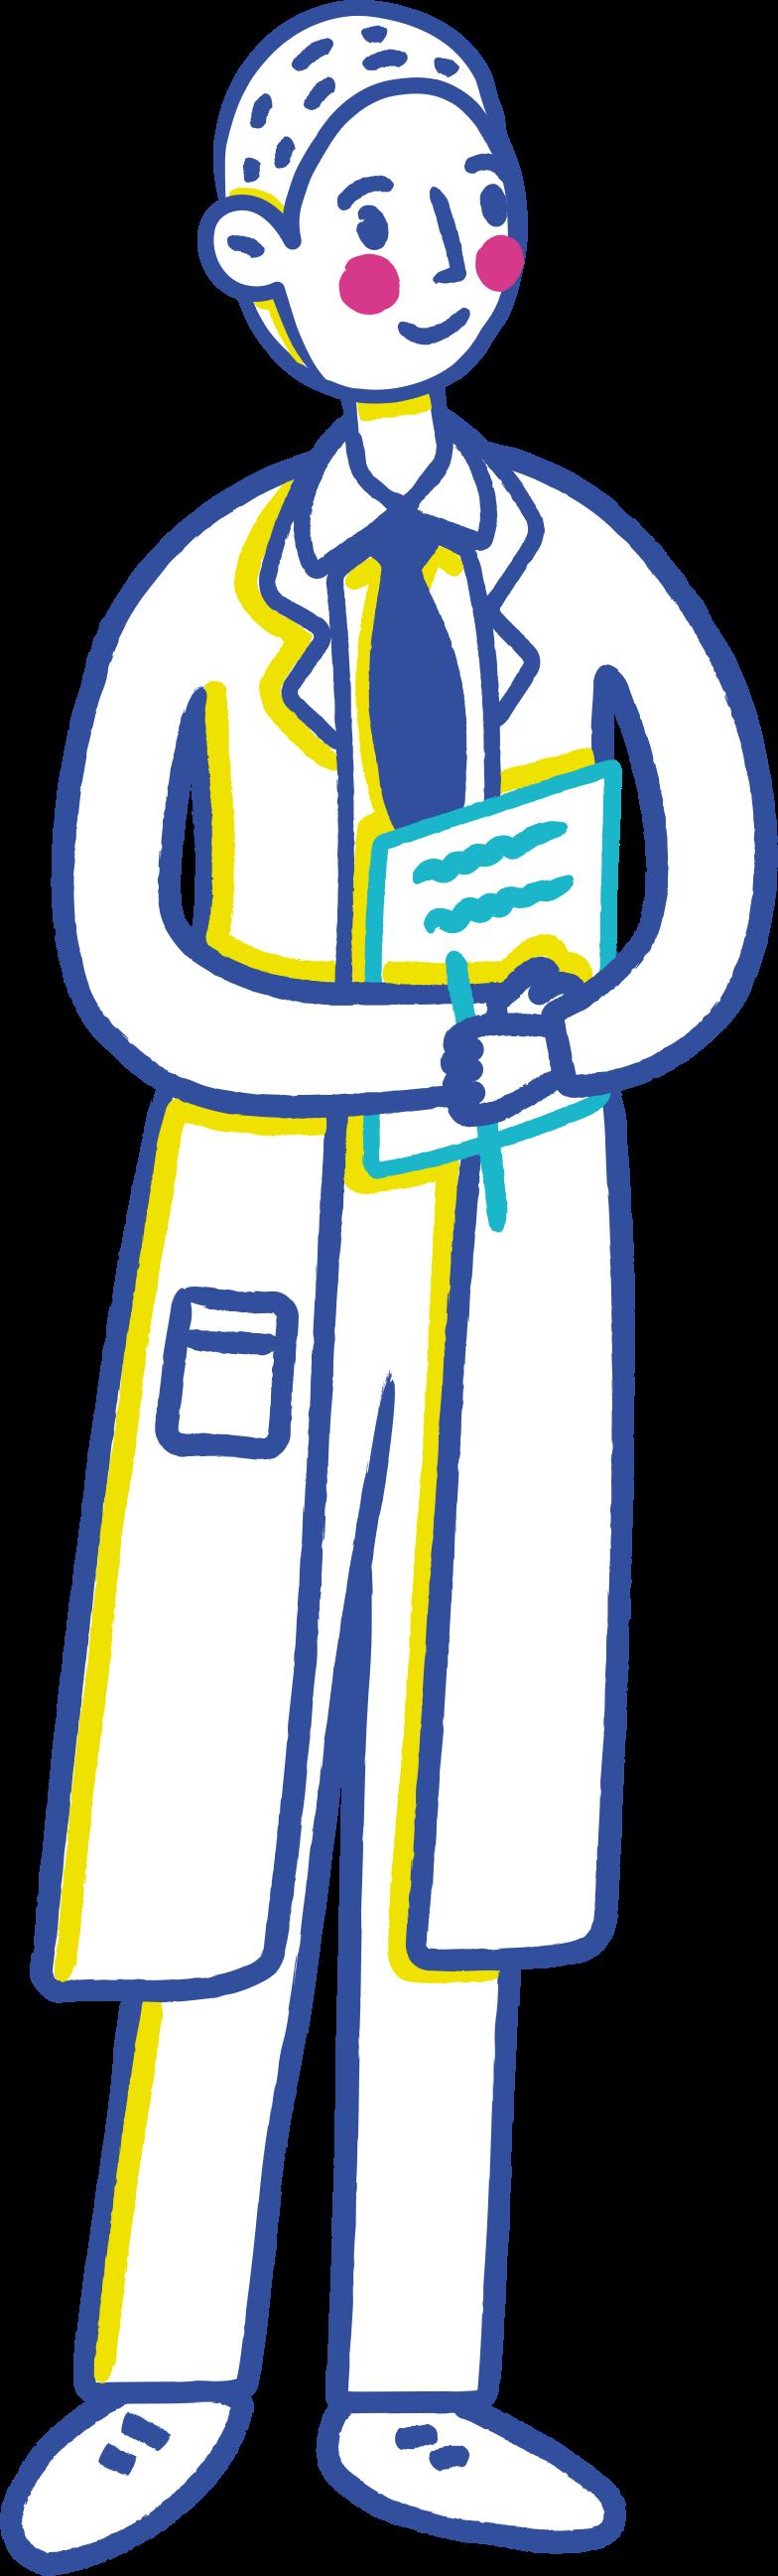 scientist Clipart illustration in PNG, SVG